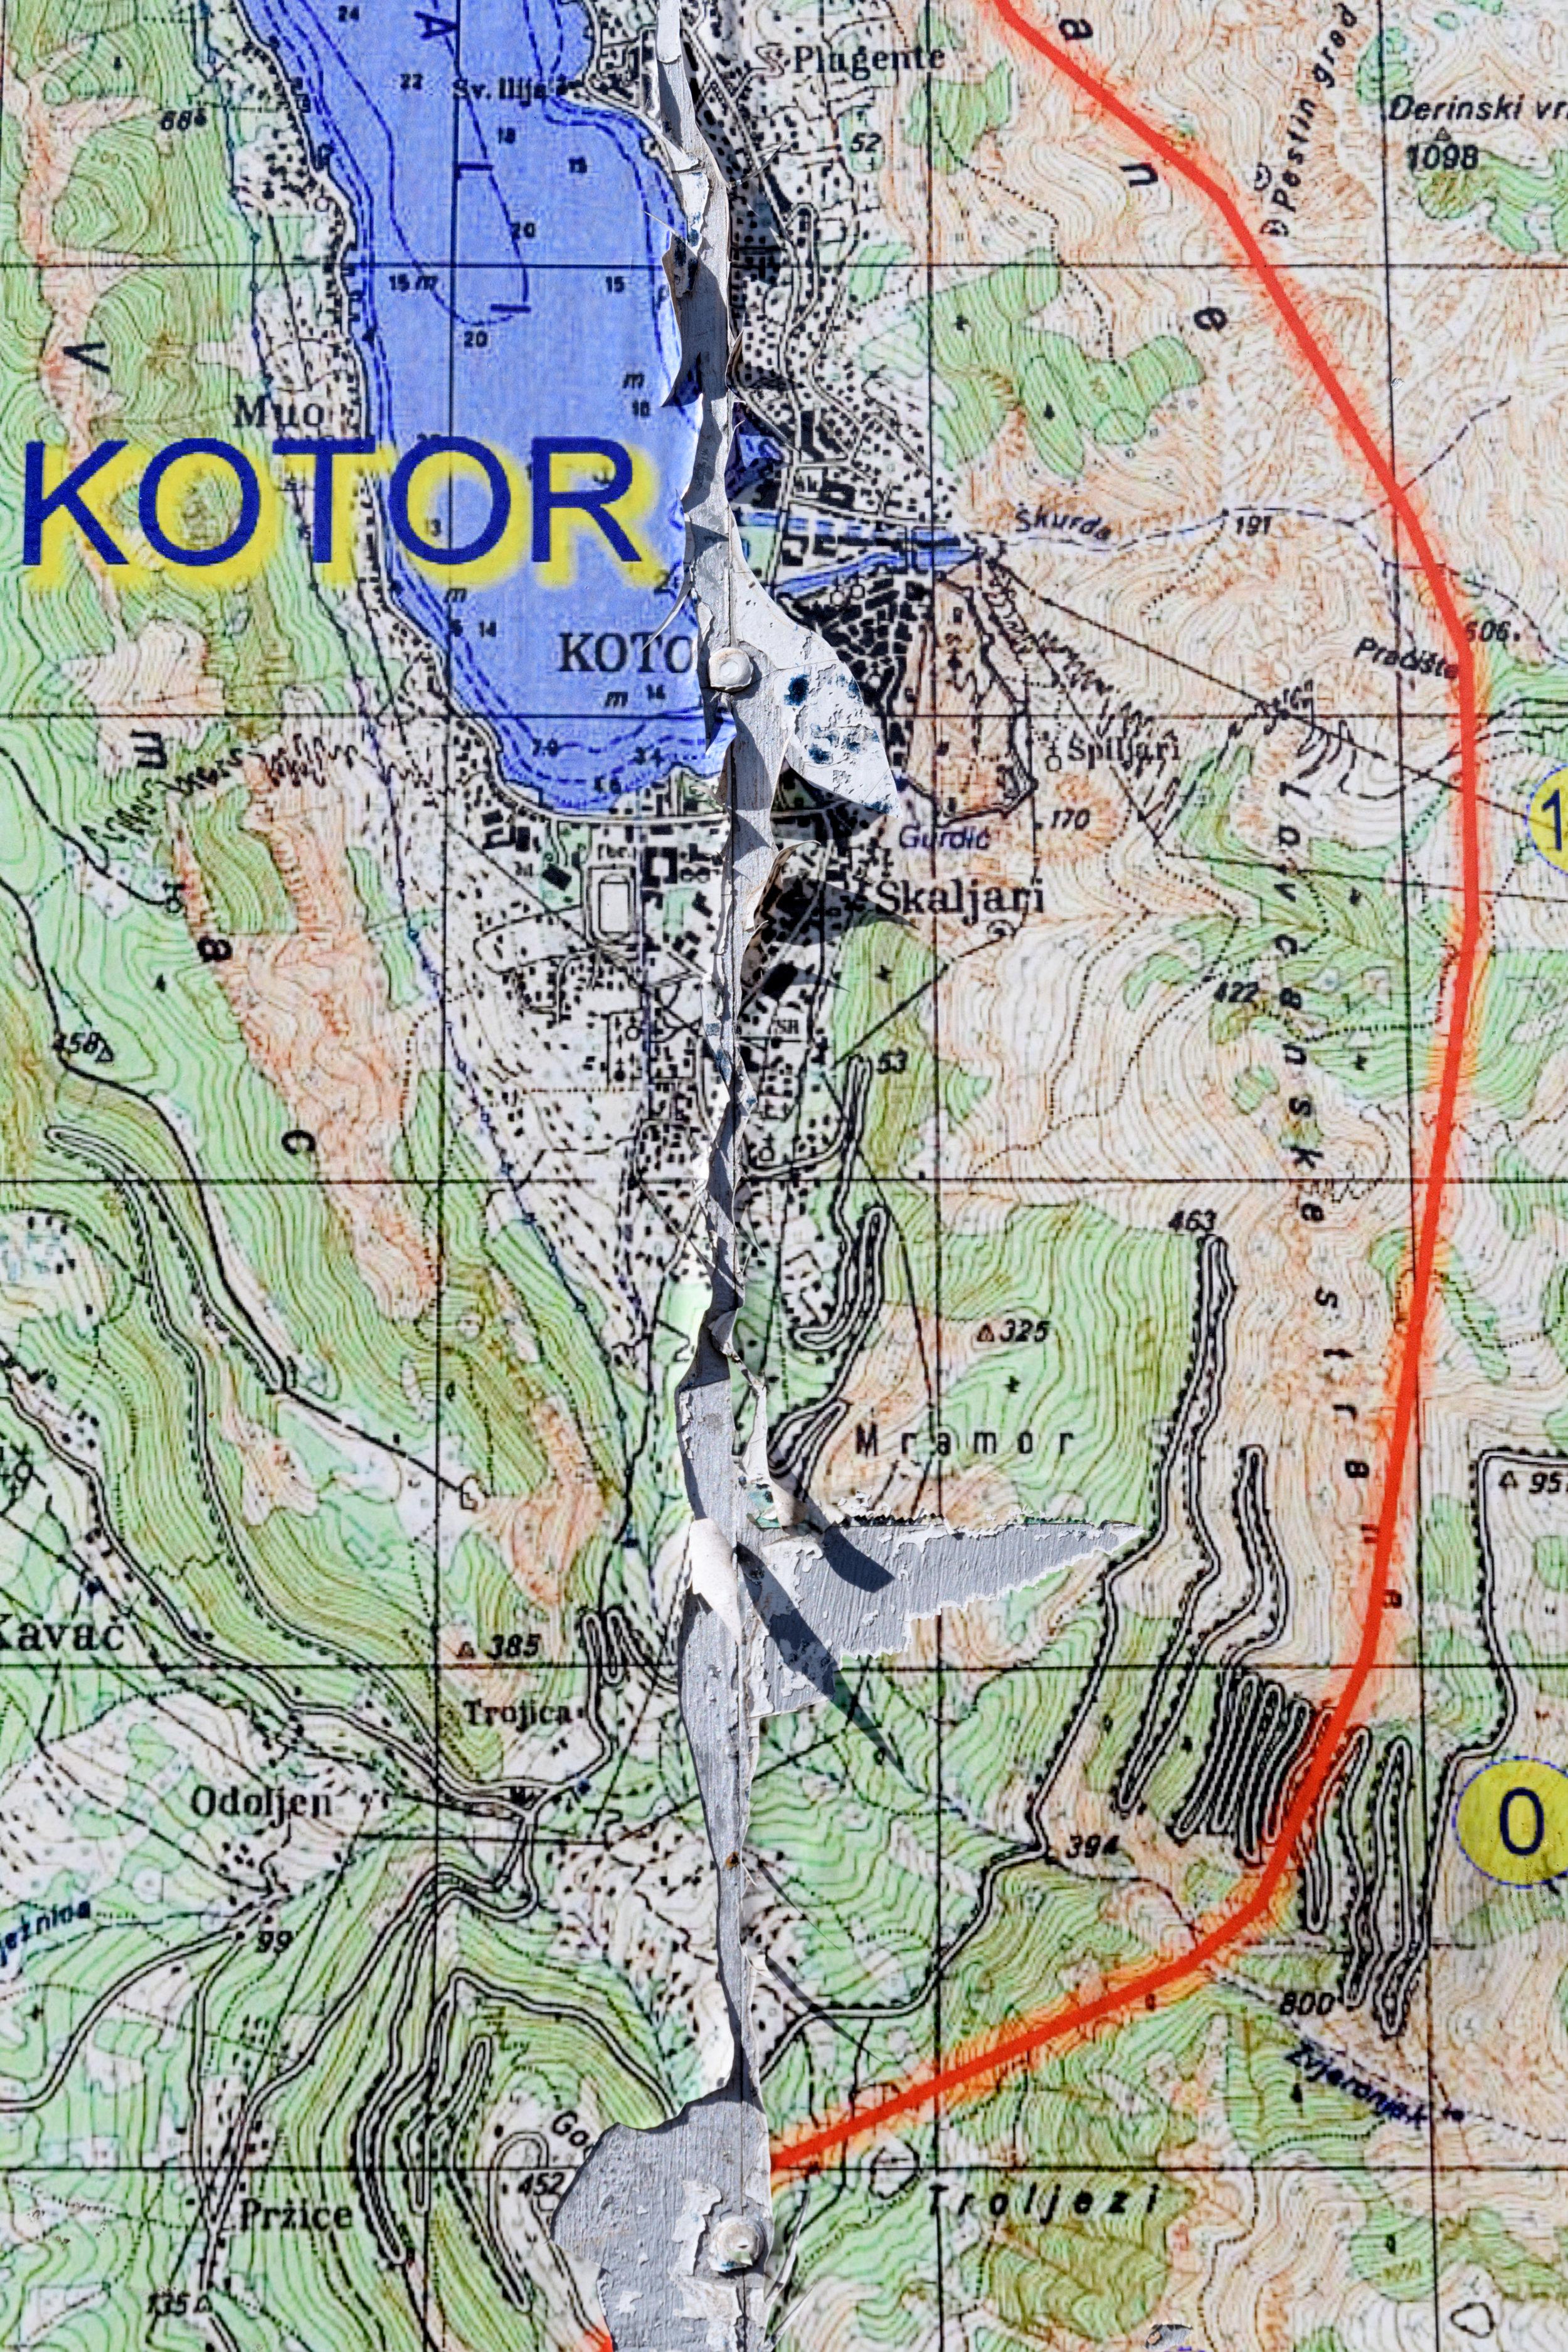 20171008 - Kotor - 205.jpg